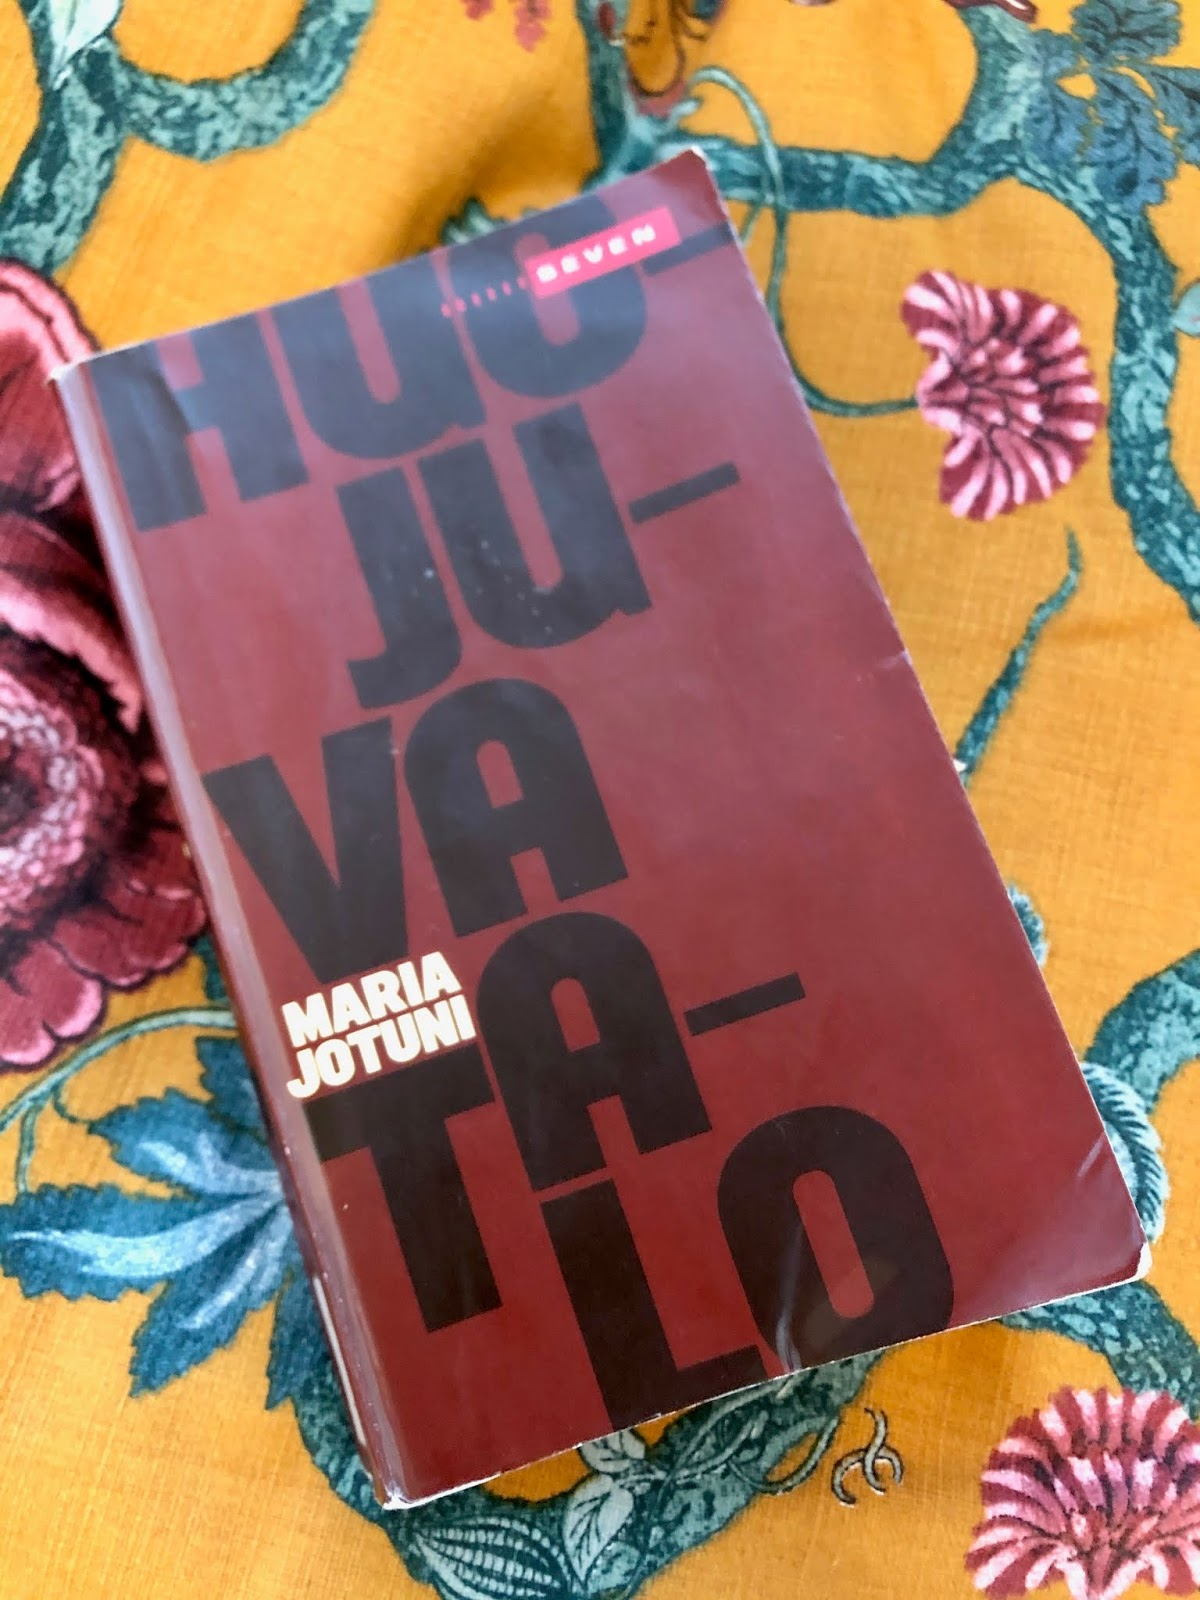 Maria Jotuni Huojuva Talo